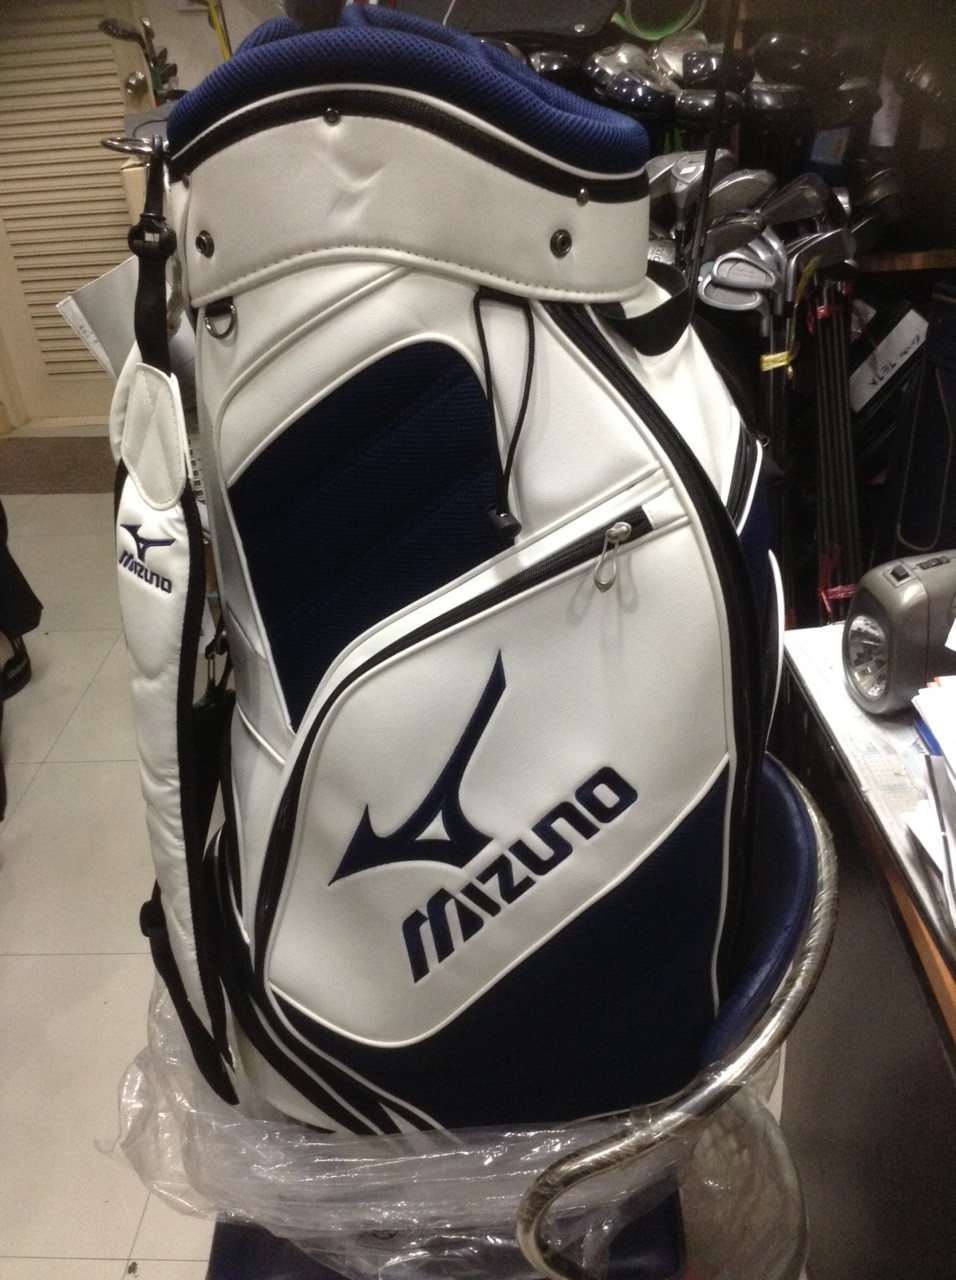 5000 Mizuno bag ของใหม่ขายราคามือสอง